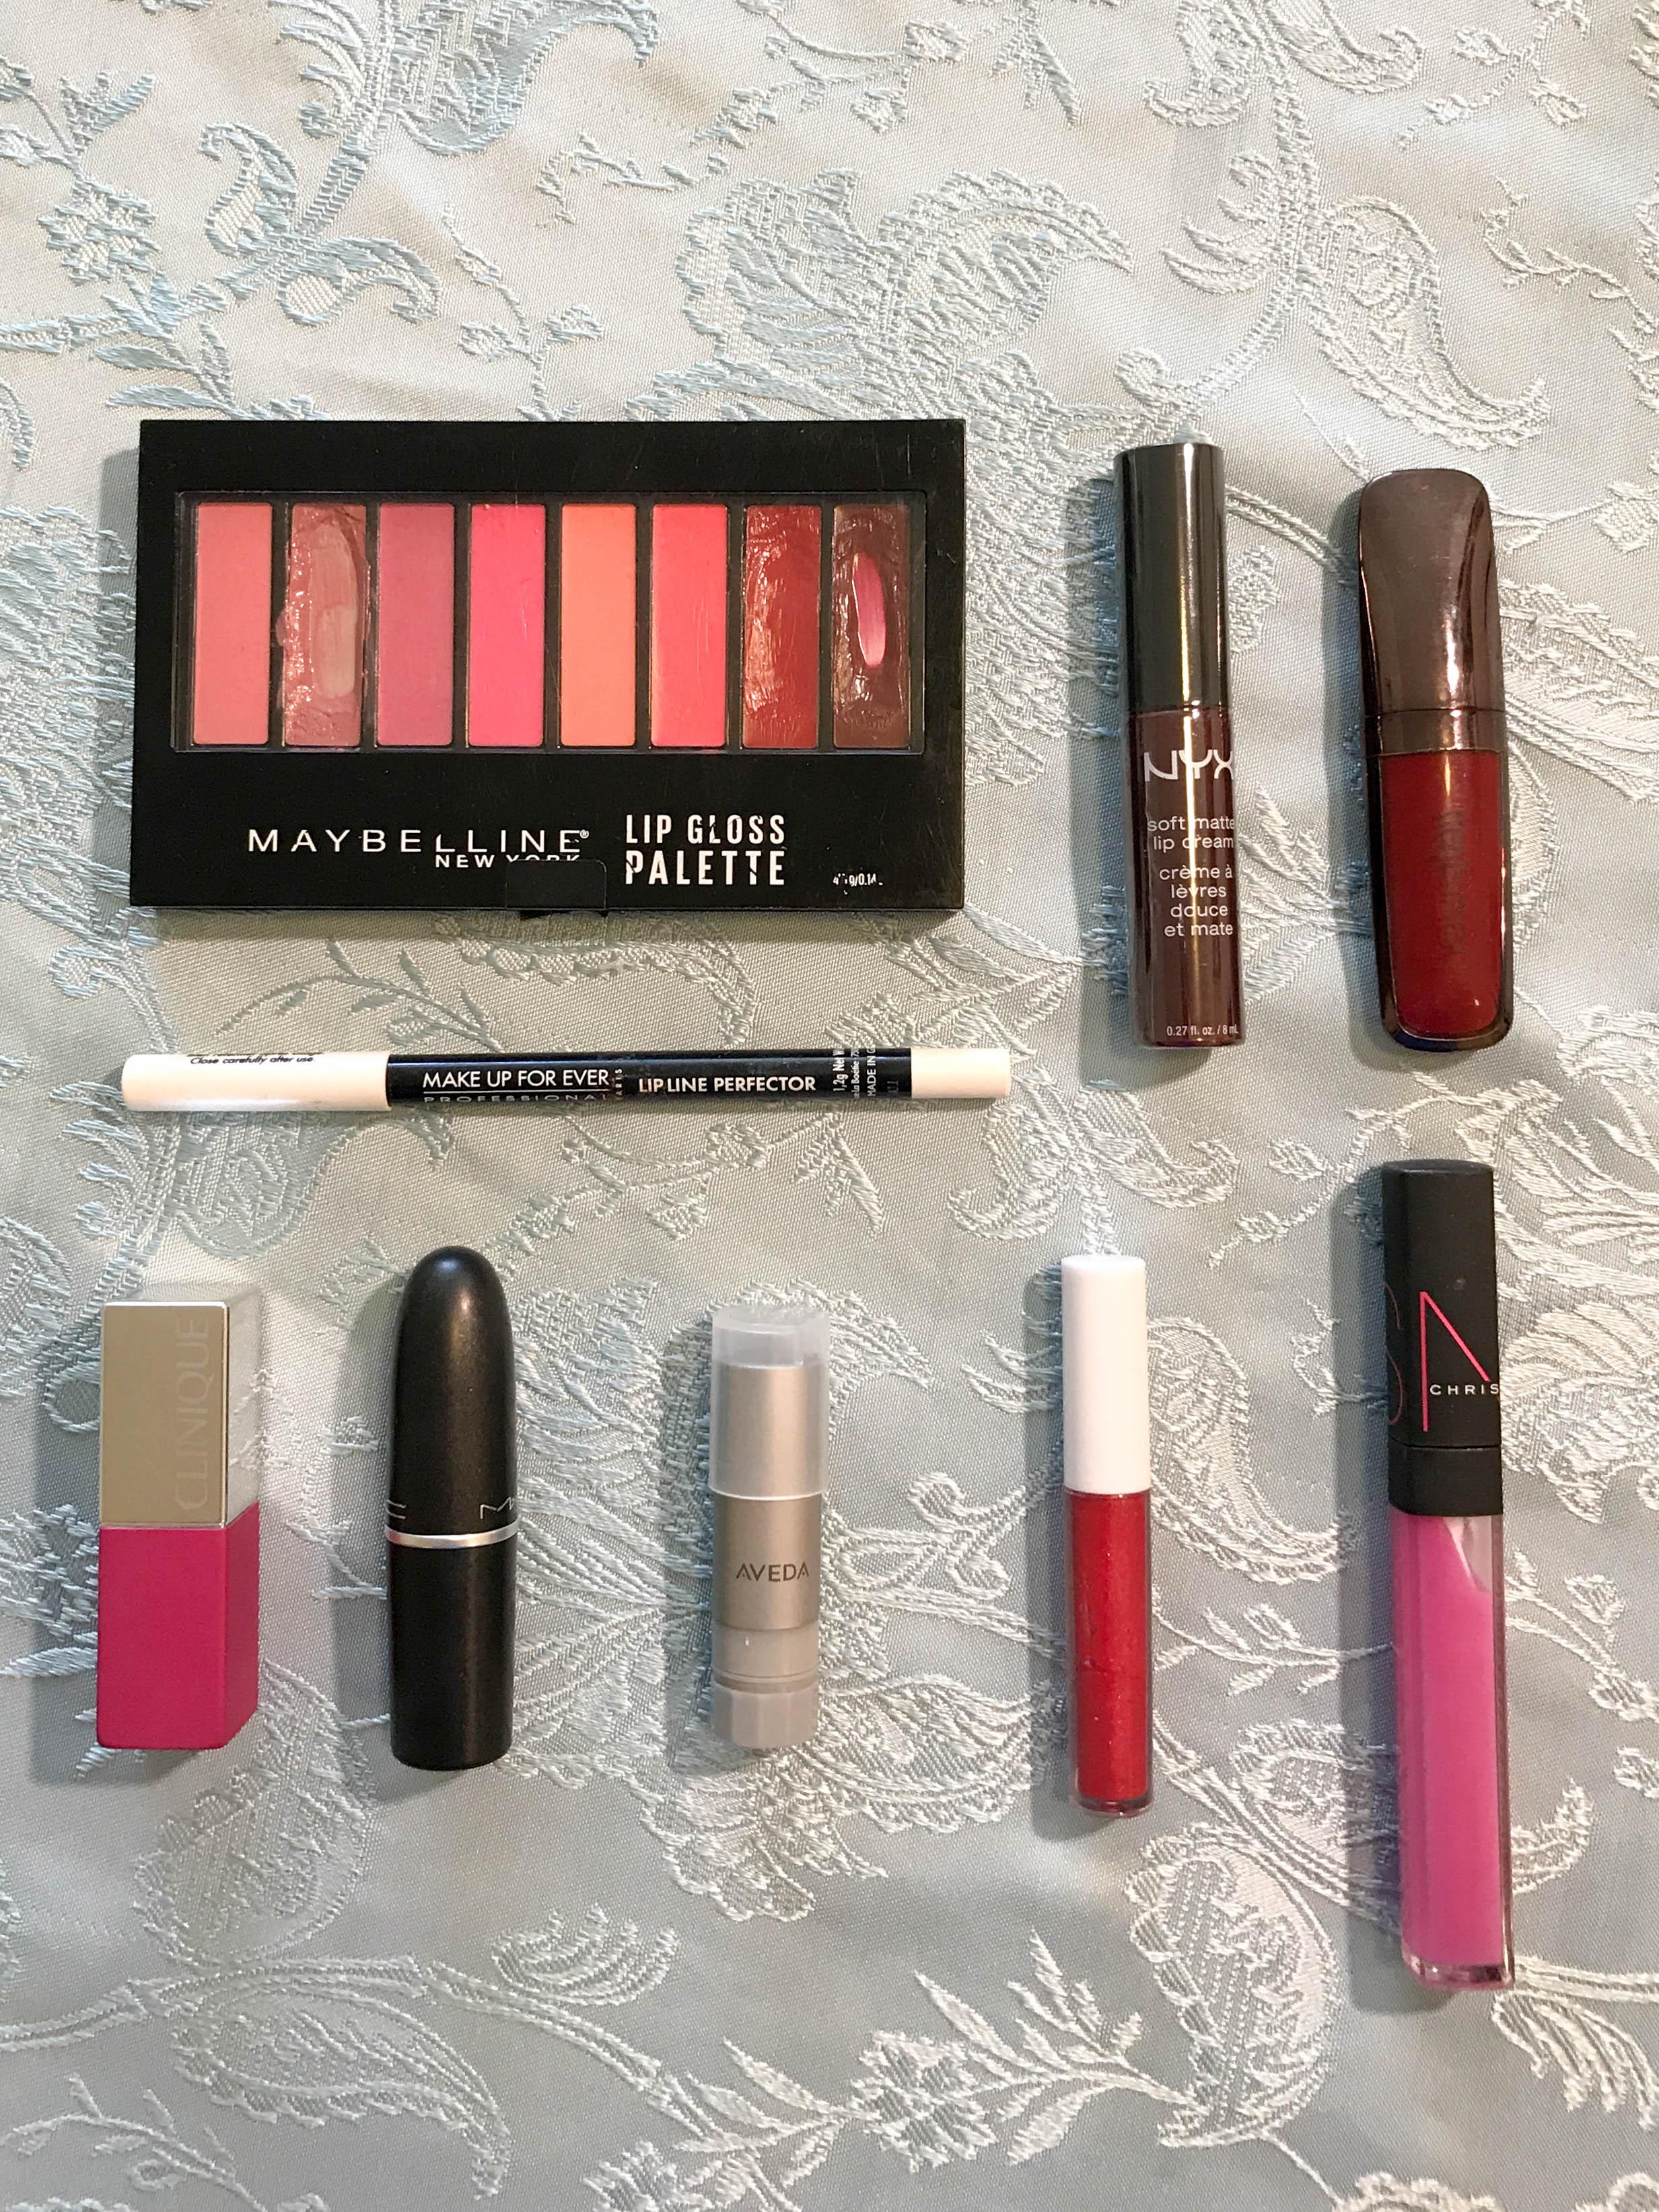 Lips: 1 clear liner, 1 chapstick, 7 lipsticks